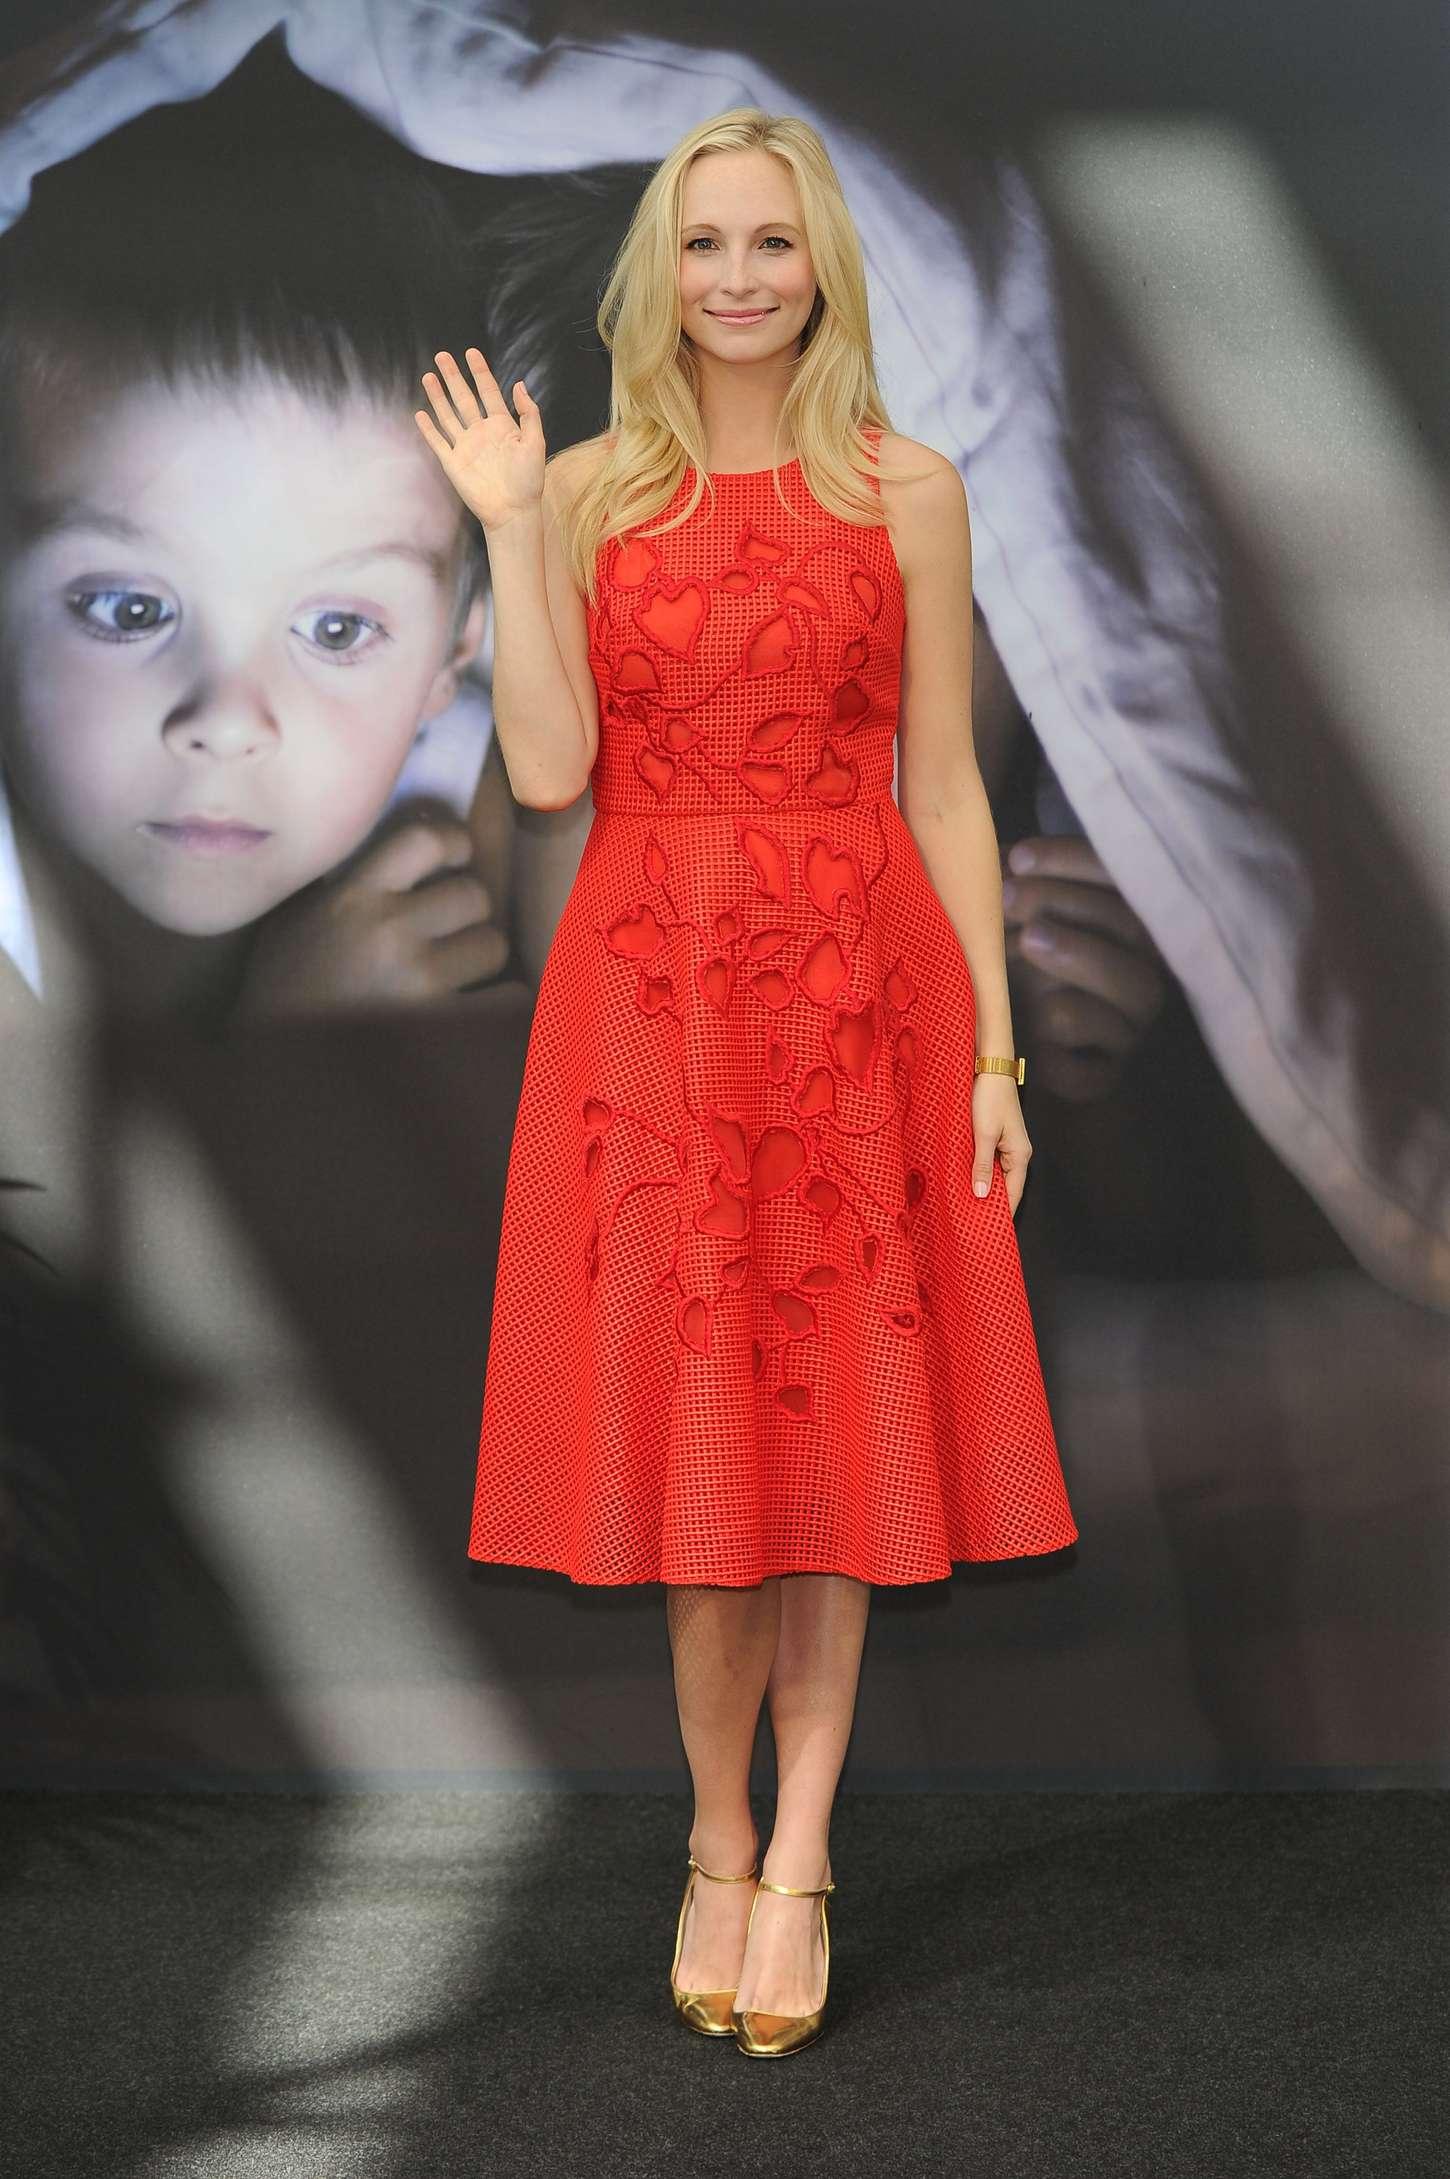 Candice Accola The Vampire Diaries Photocall at Monte Carlo TV Festival in Monaco